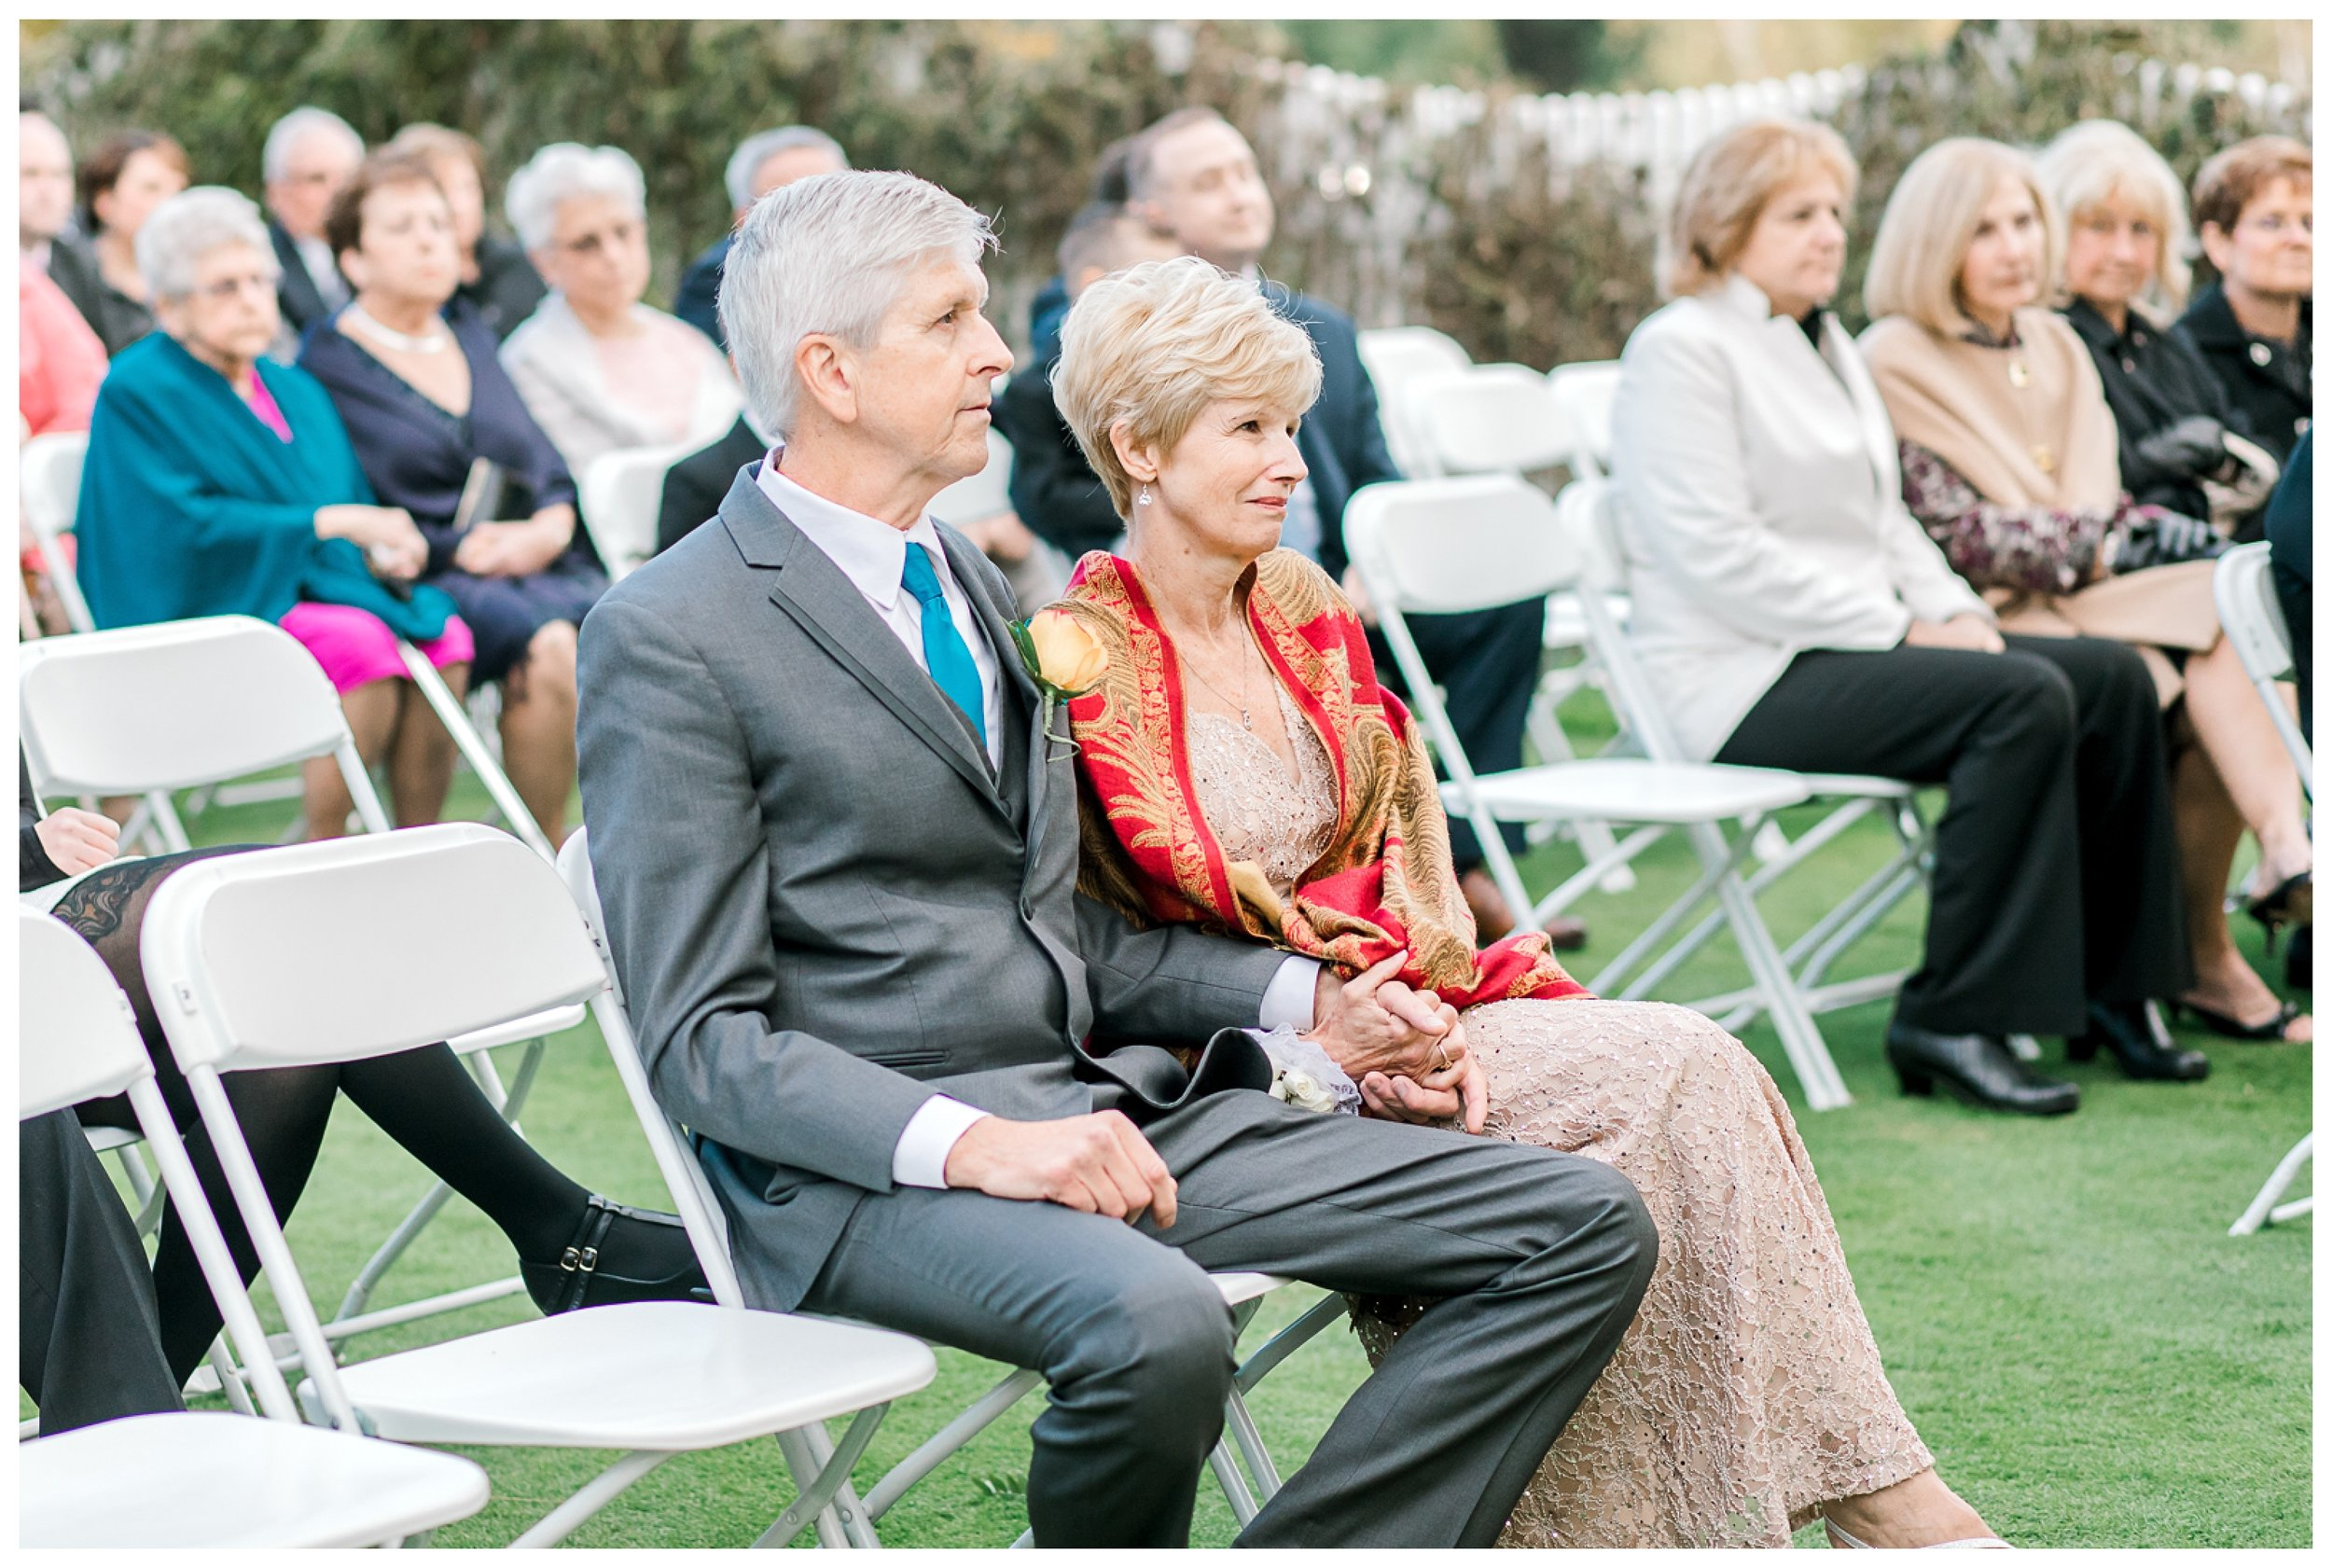 pleasant_valley_country_club_wedding_sutton_erica_pezente_photography (50).jpg